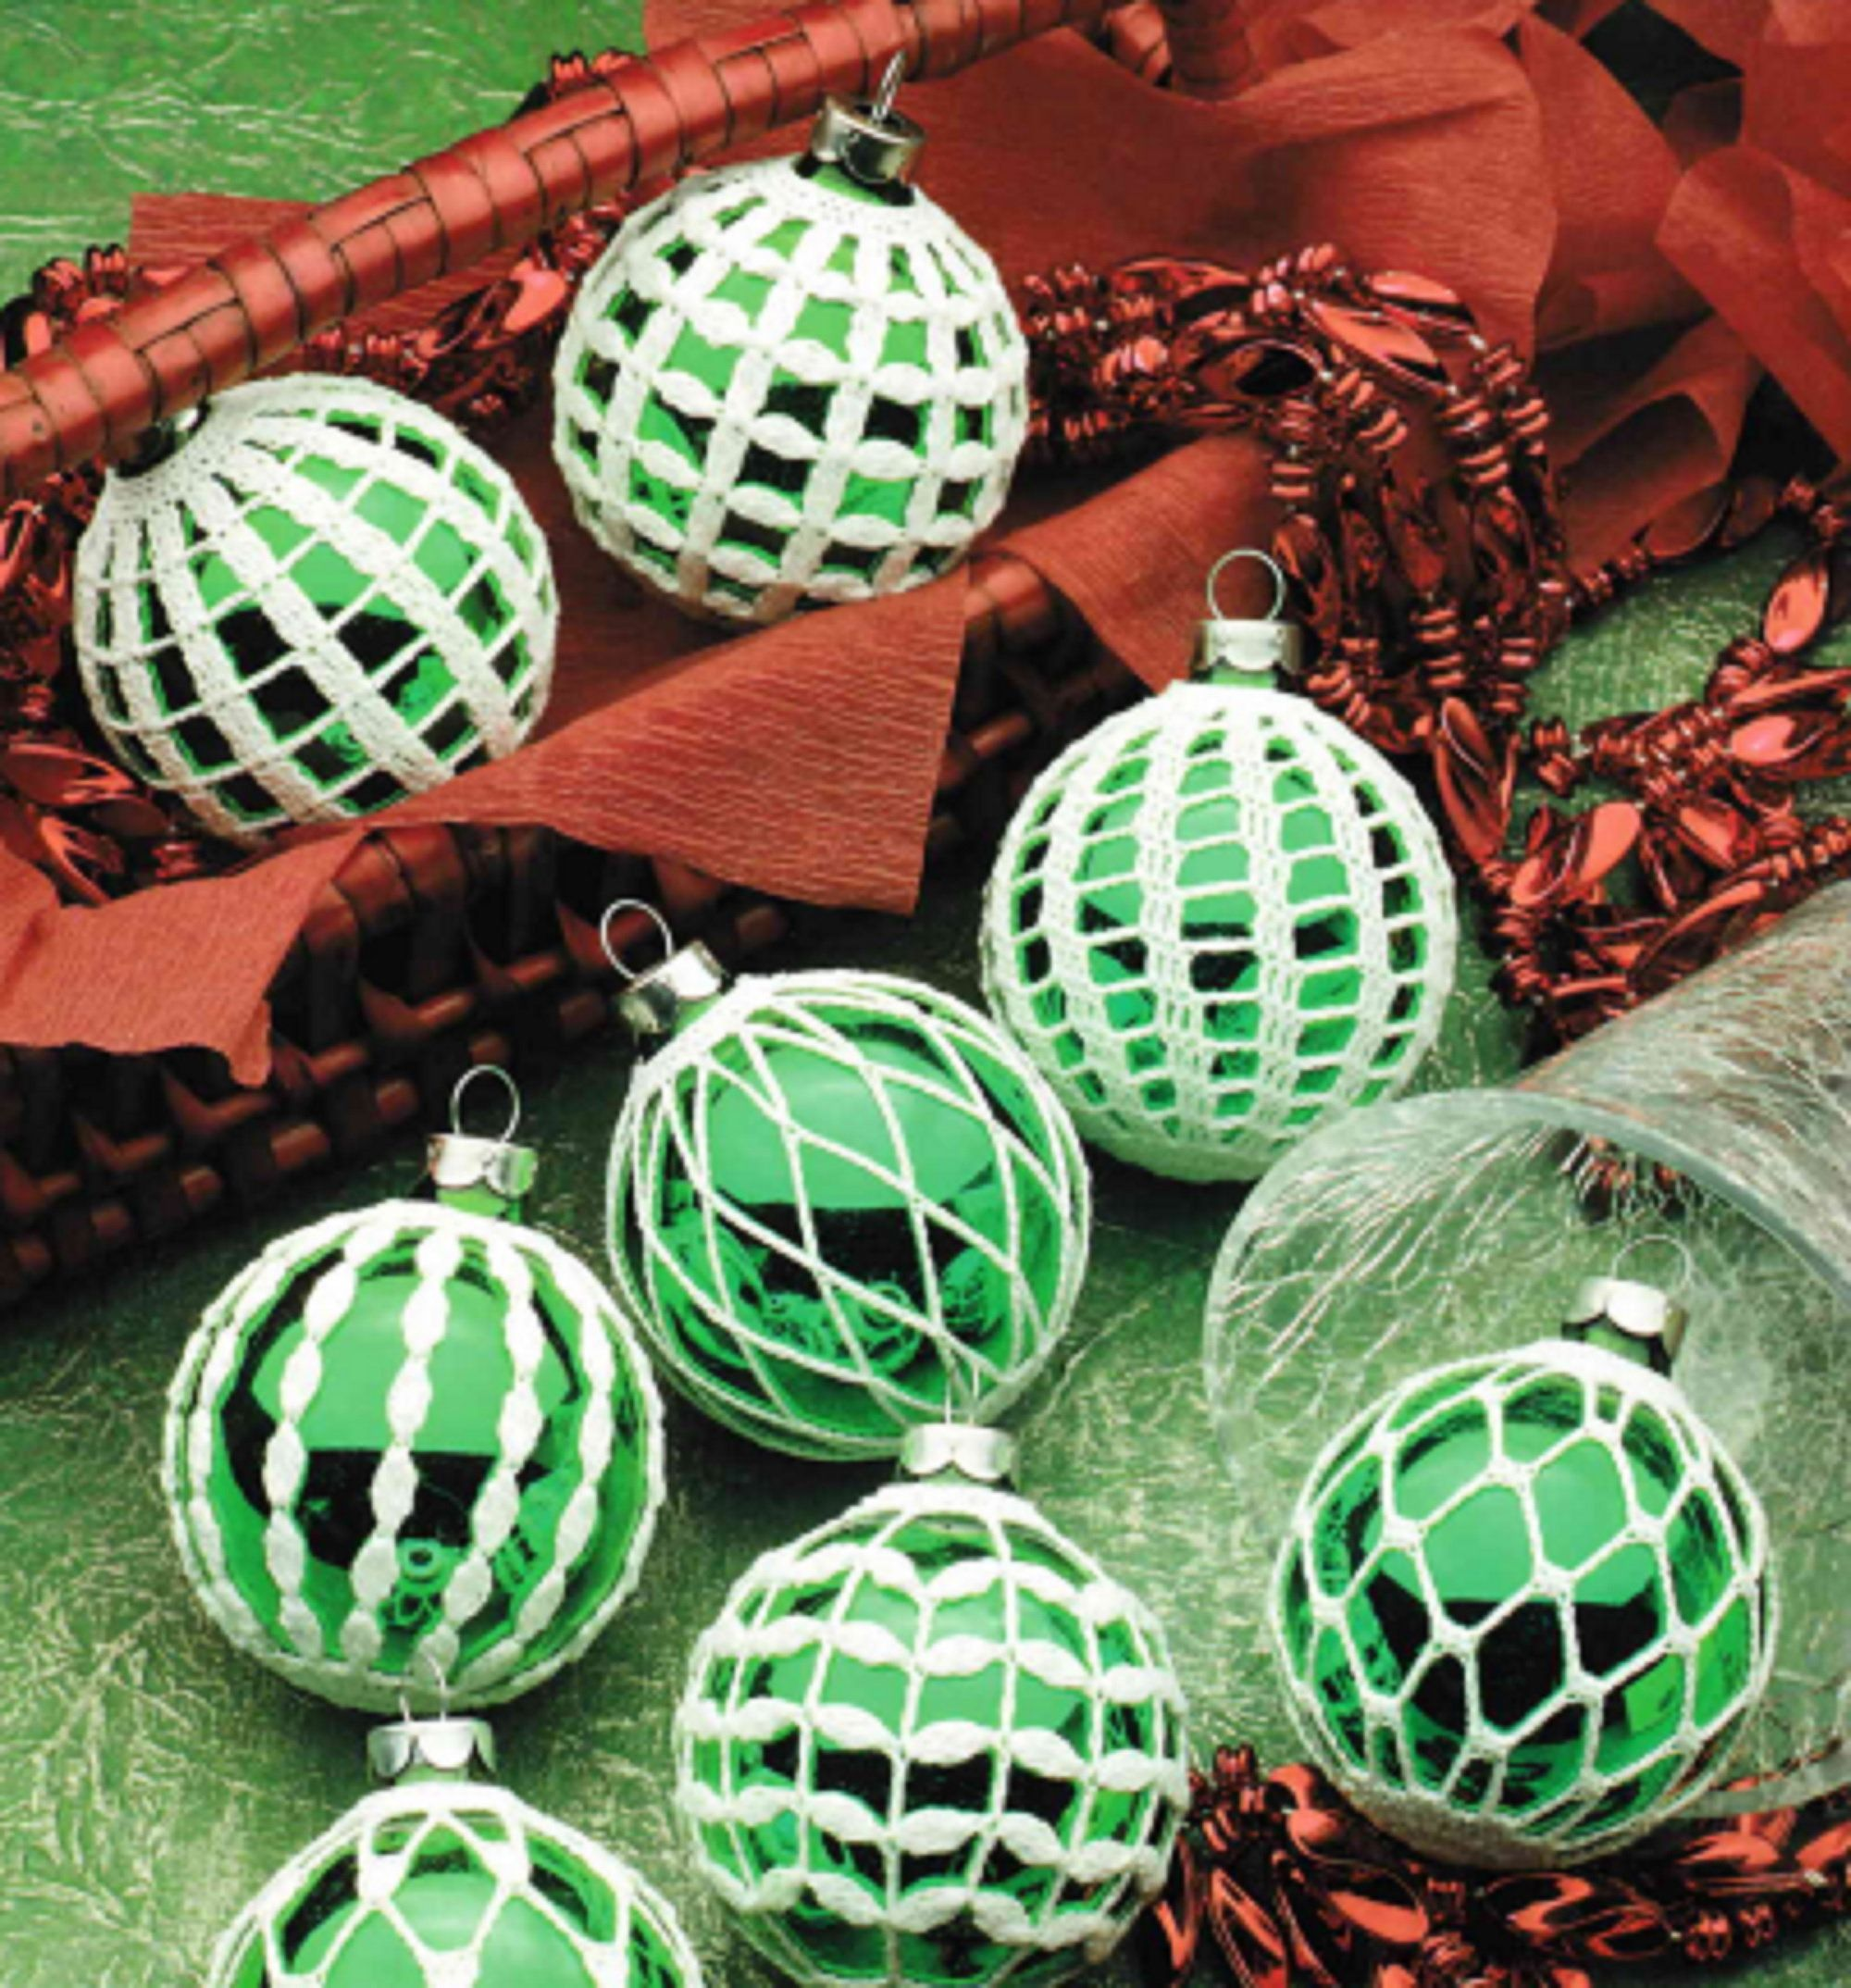 15 Designs Dainty Tree Decor Ornaments Thread Crochet Pattern Pdf Instant Download Christmas Balls Ornament Crochet Patterns Ball Covers In 2020 Tree Decor Ornament Decor Crochet Patterns